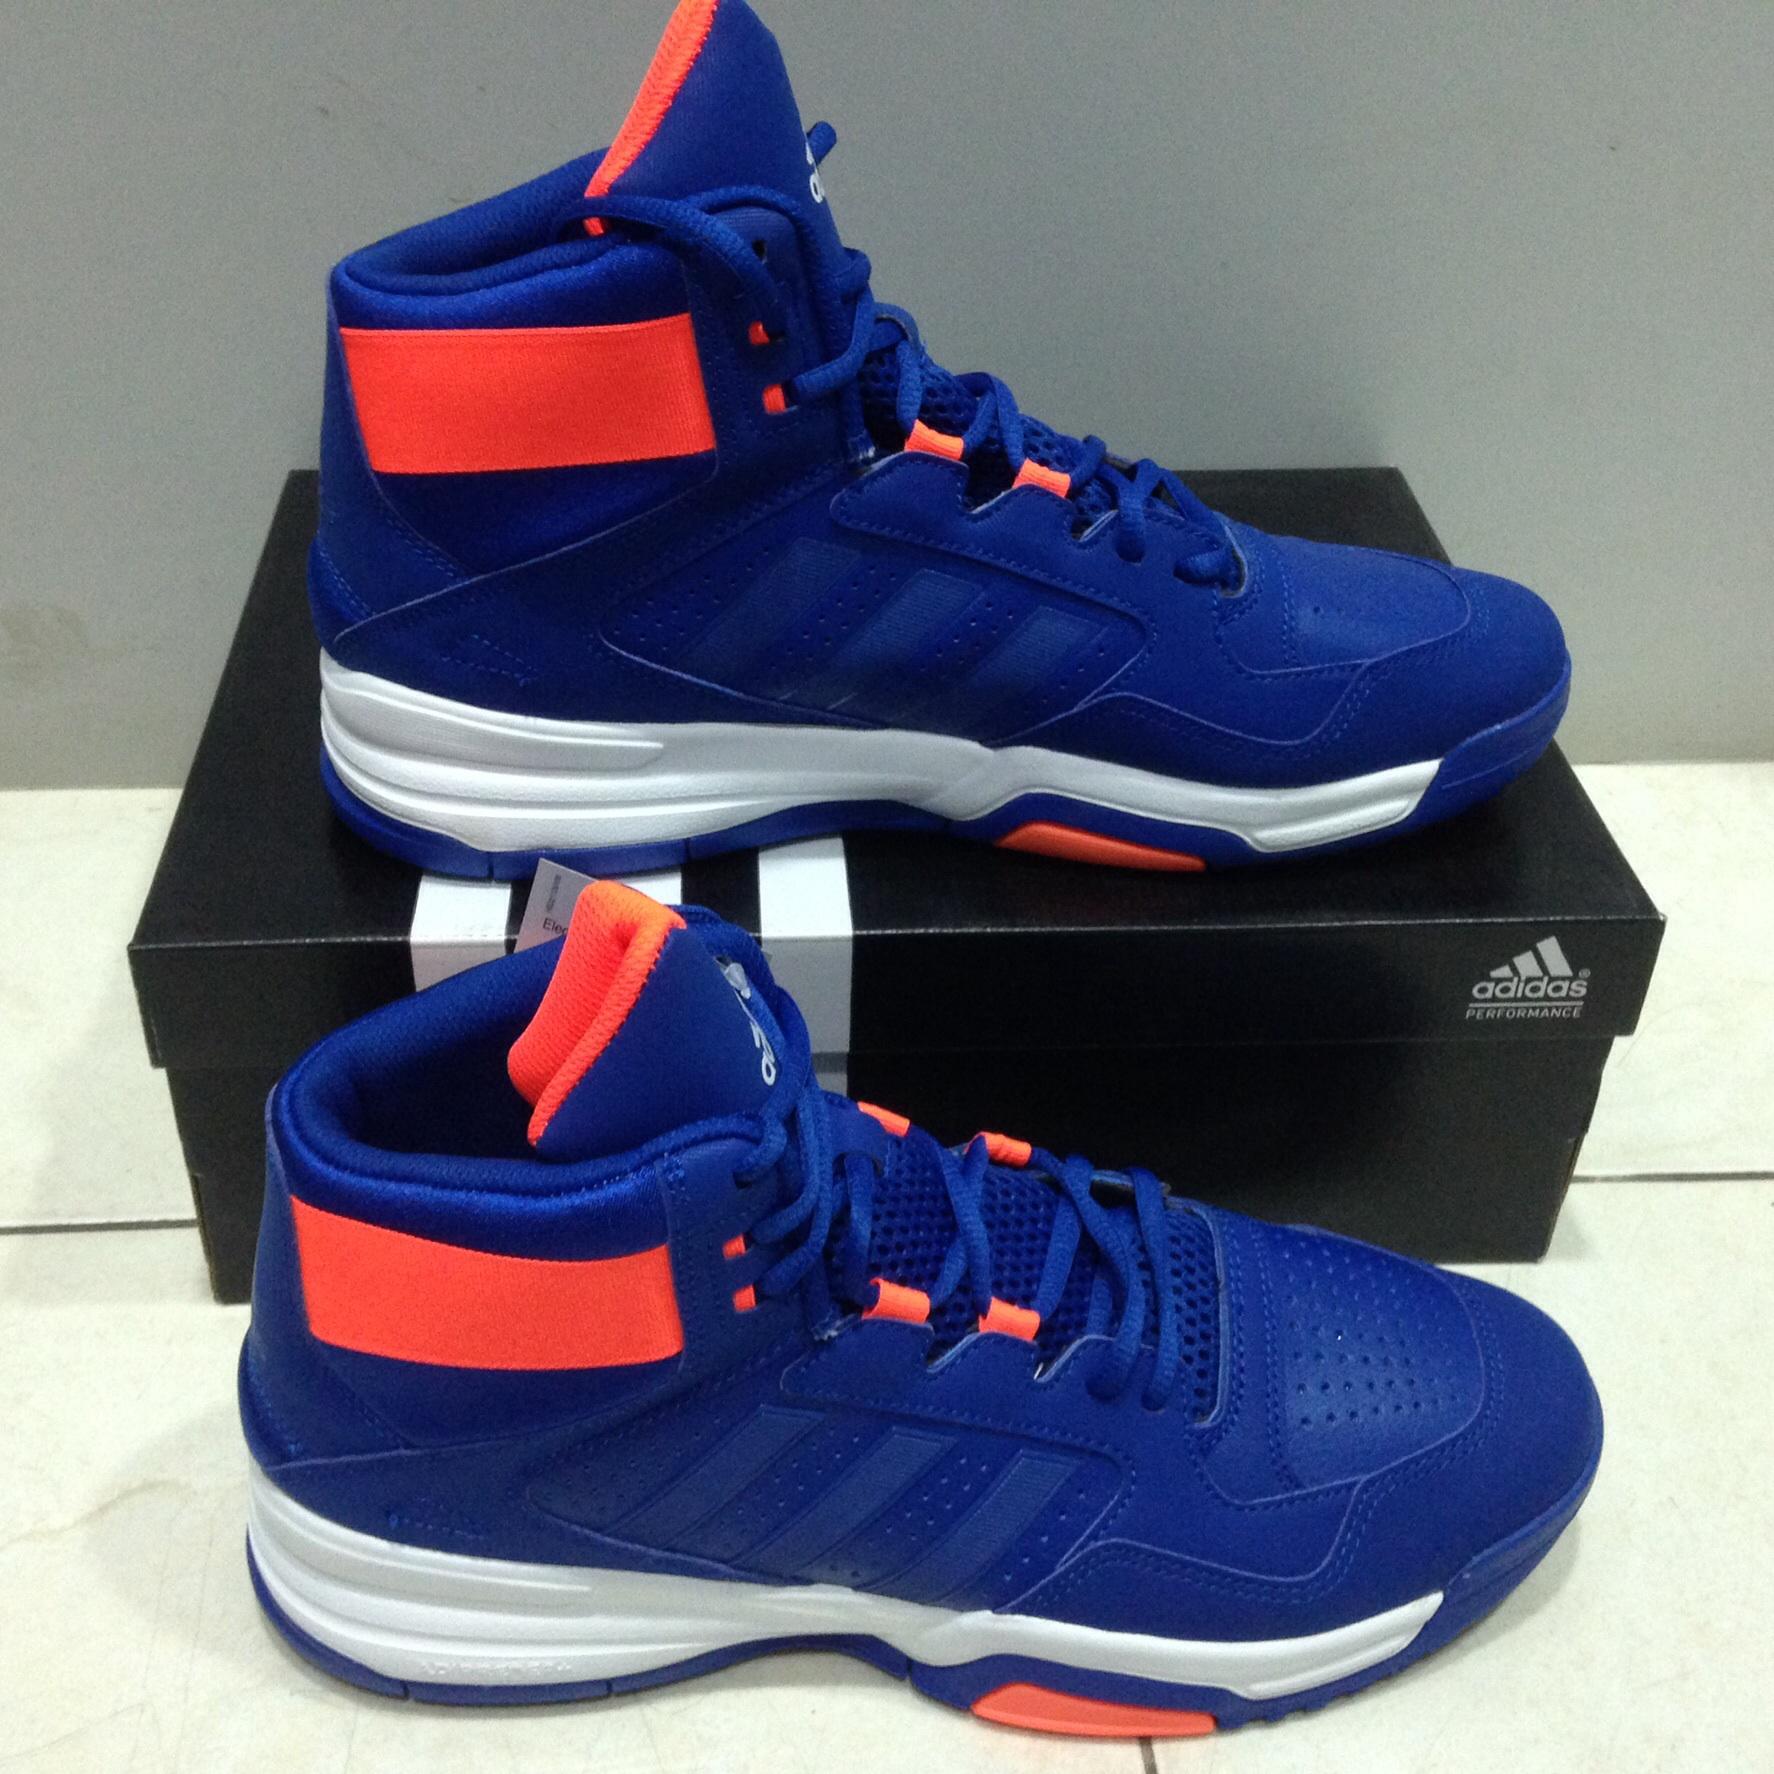 Jual Adidas Electrify Warna Biru Size 42 2 3. Sepatu Basket - Sportsite ... 534633d0a9